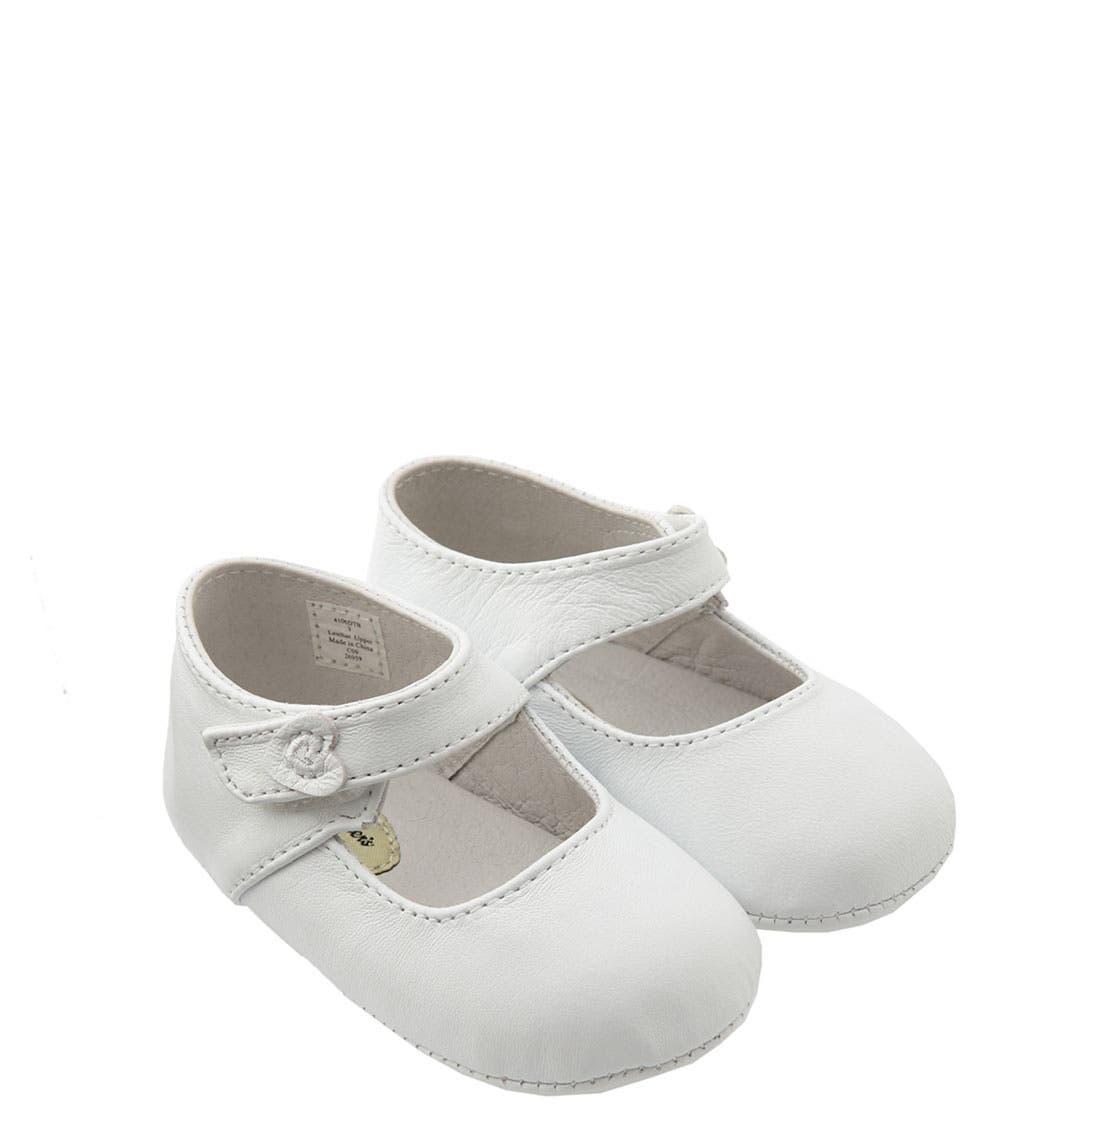 Main Image - Designer's Touch 'Hartlee' Crib Shoe (Baby)